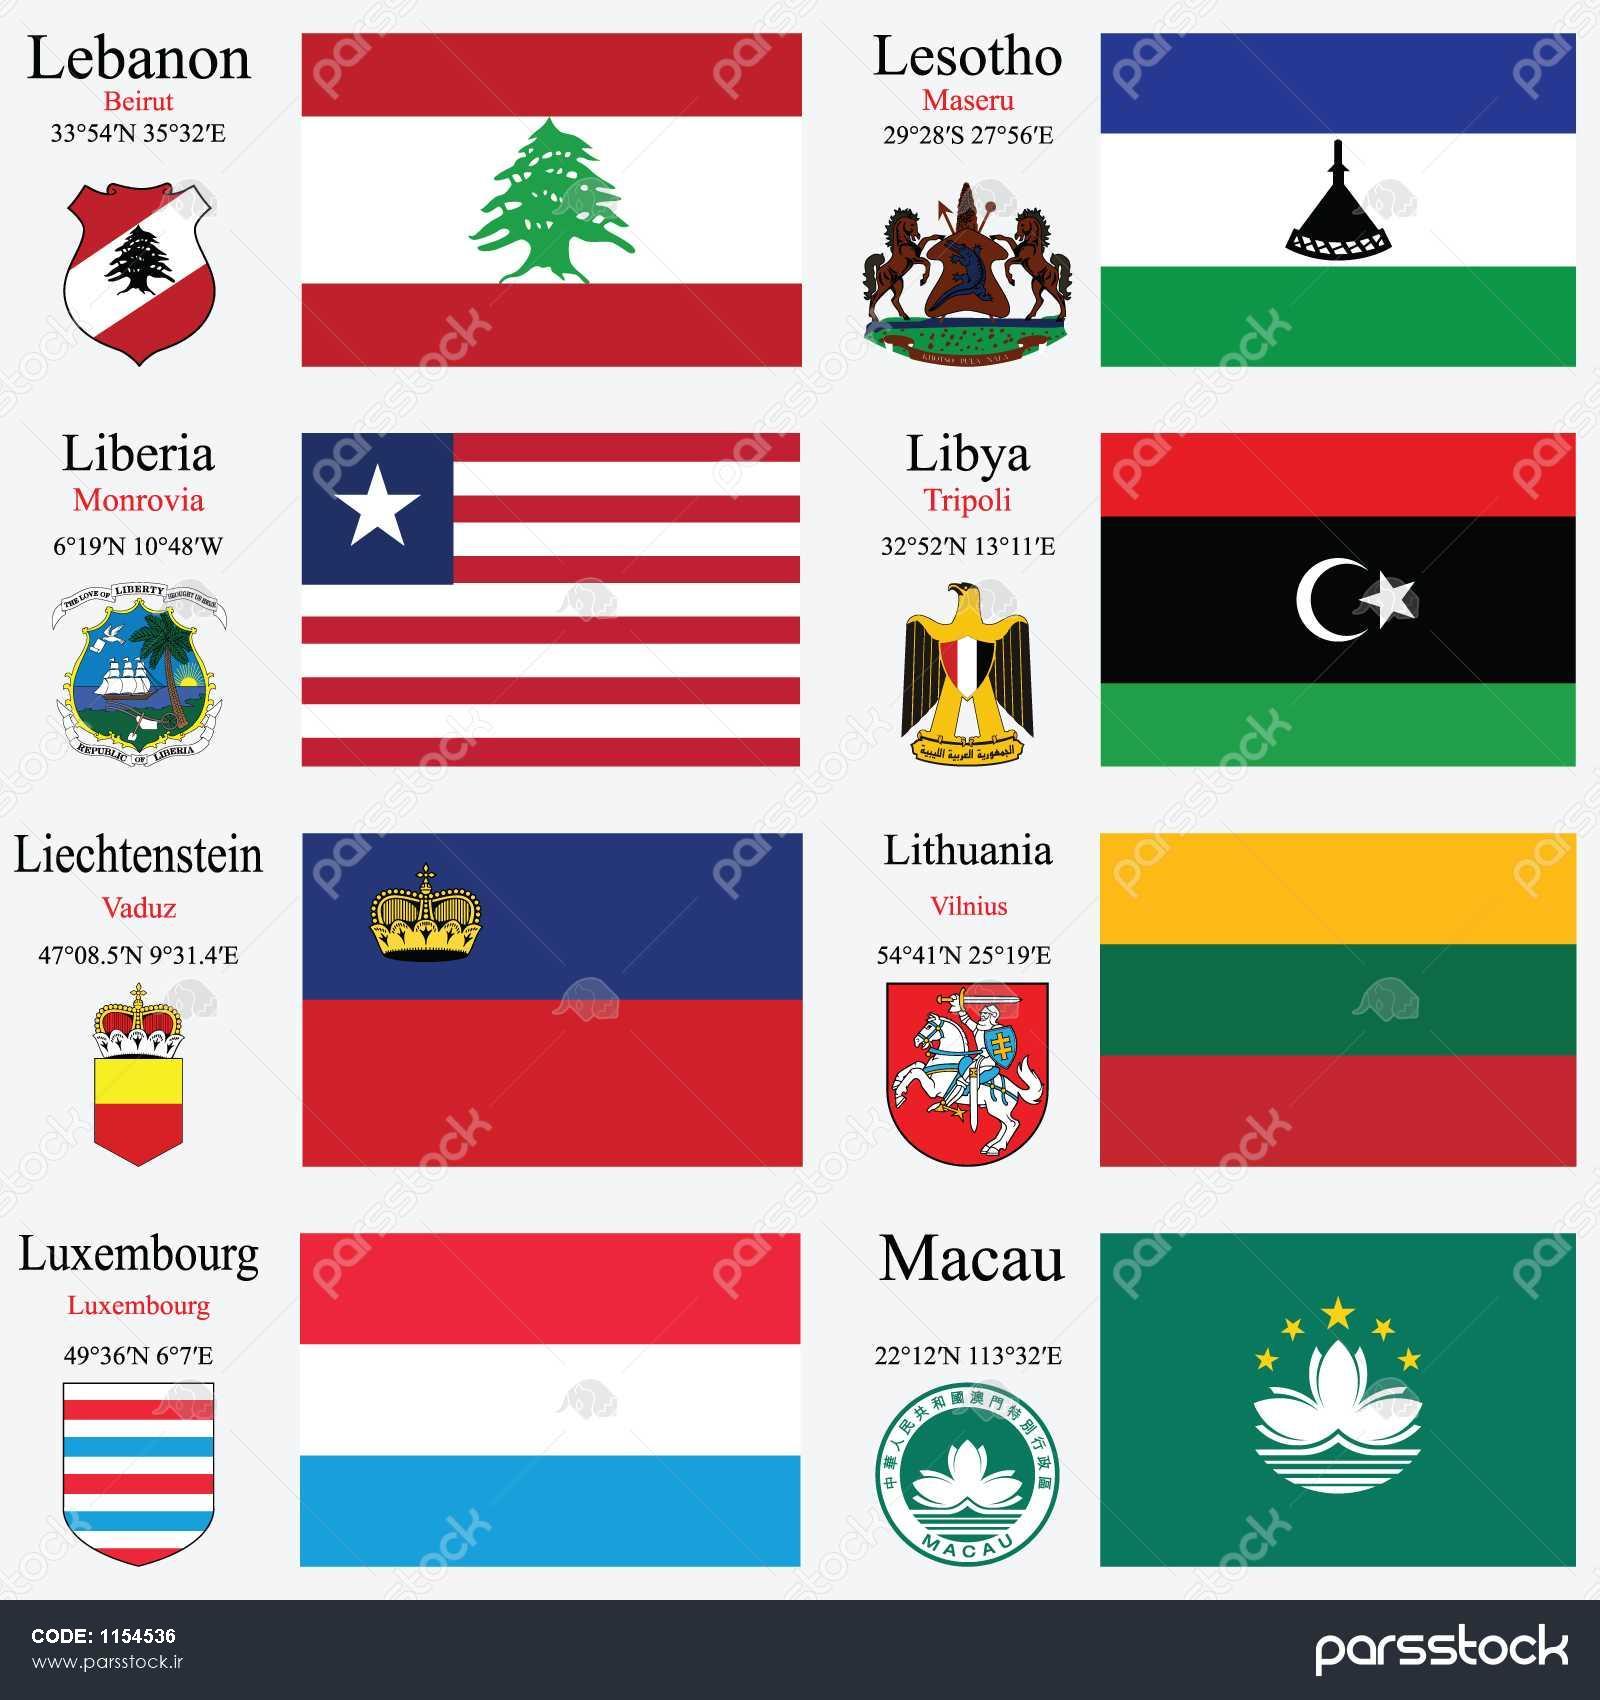 عکس پرچم کشور لیتوانی